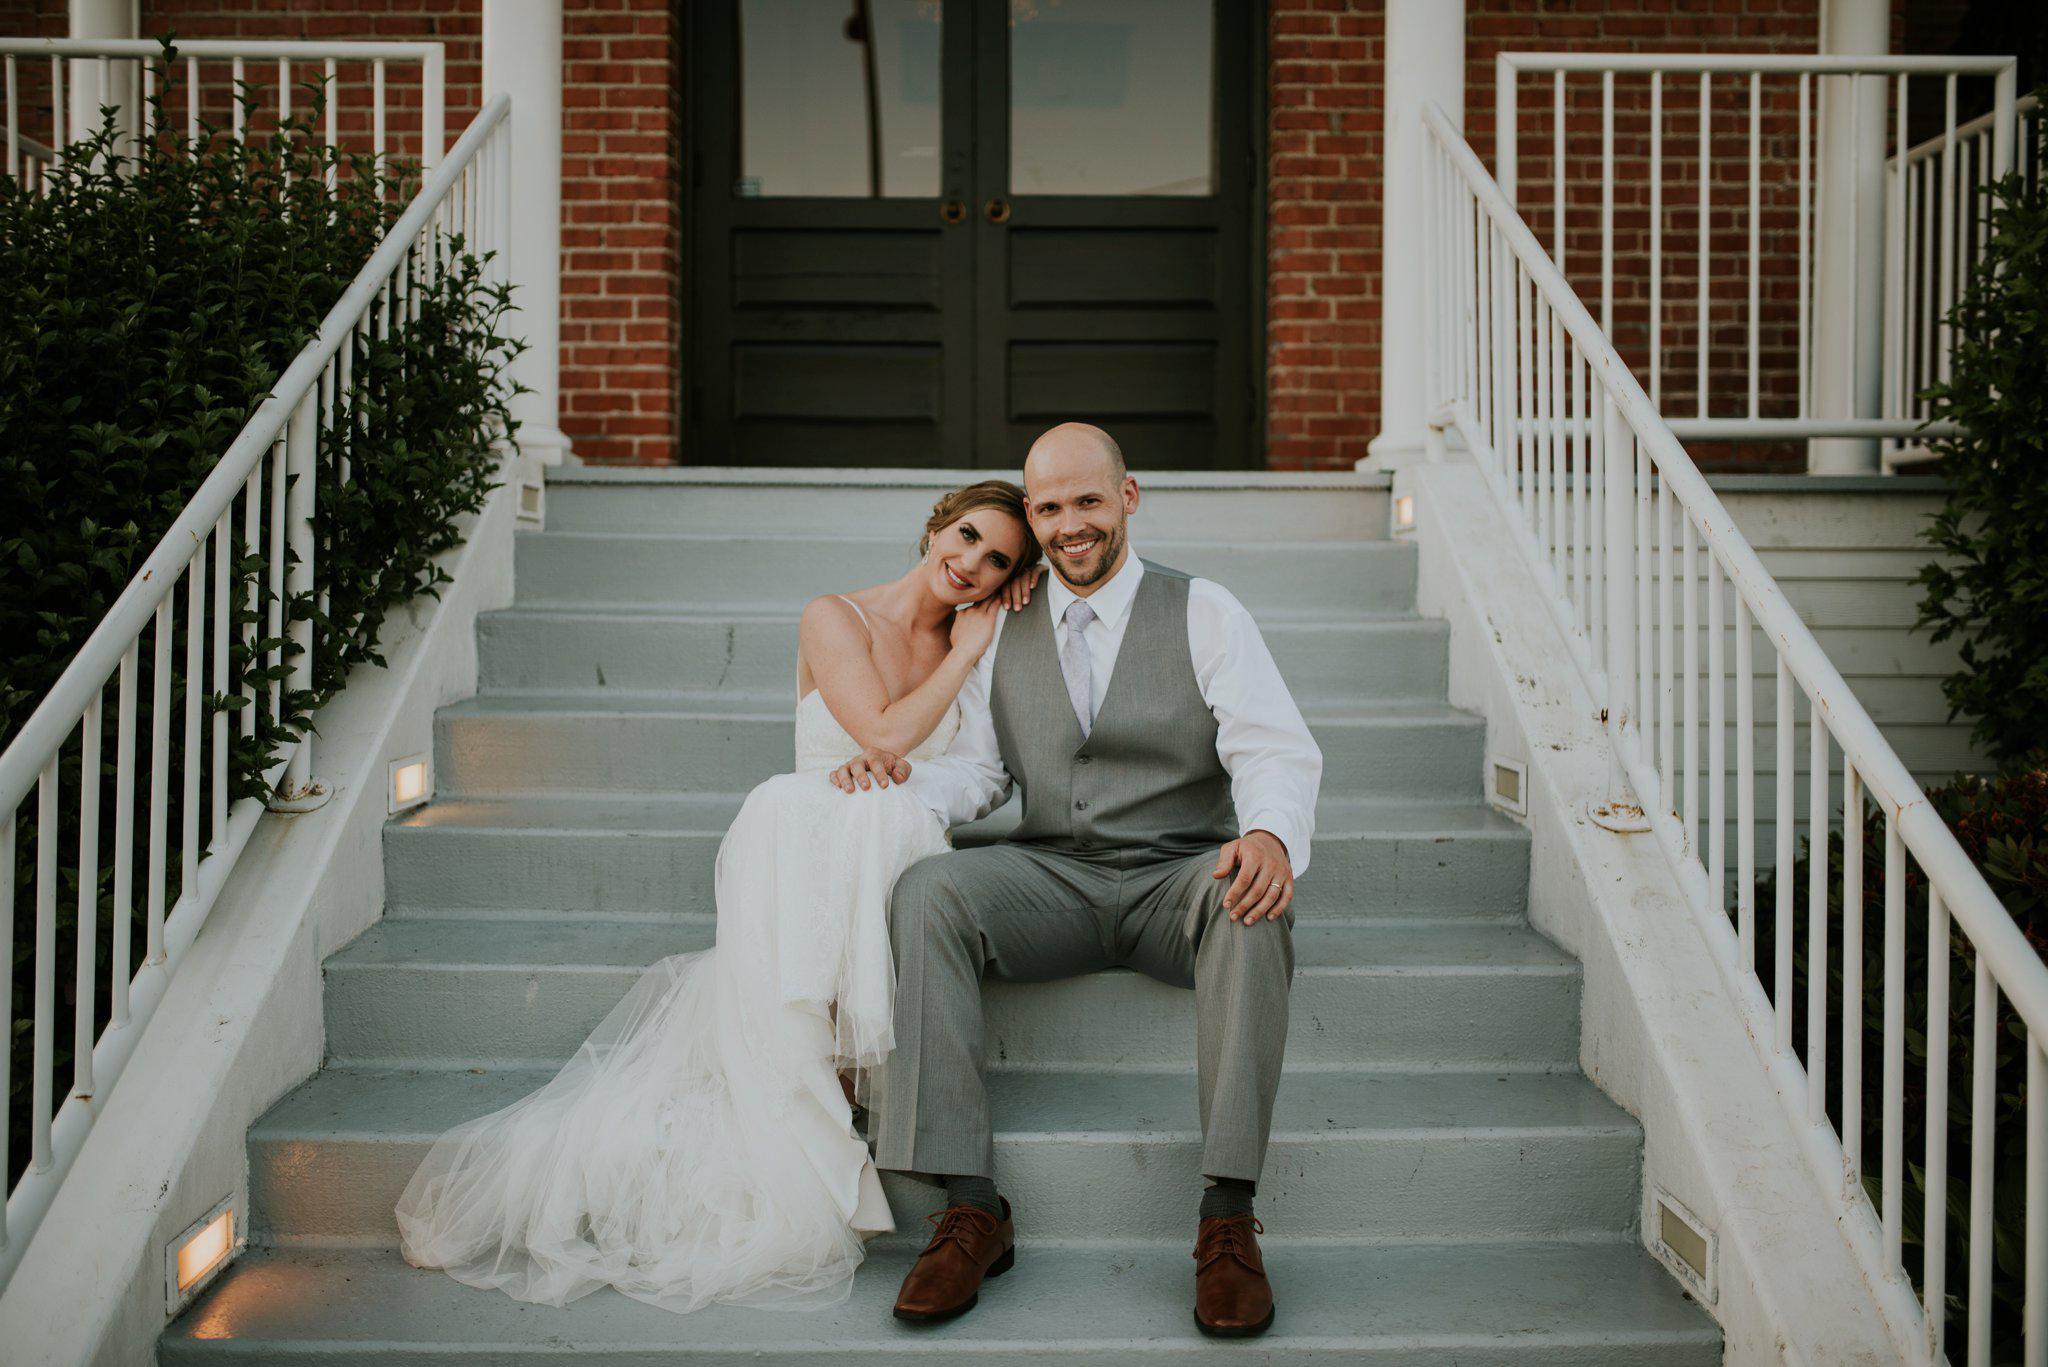 hollywood-school-house-wedding-seattle-photographer-caitlyn-nikula-105.jpg